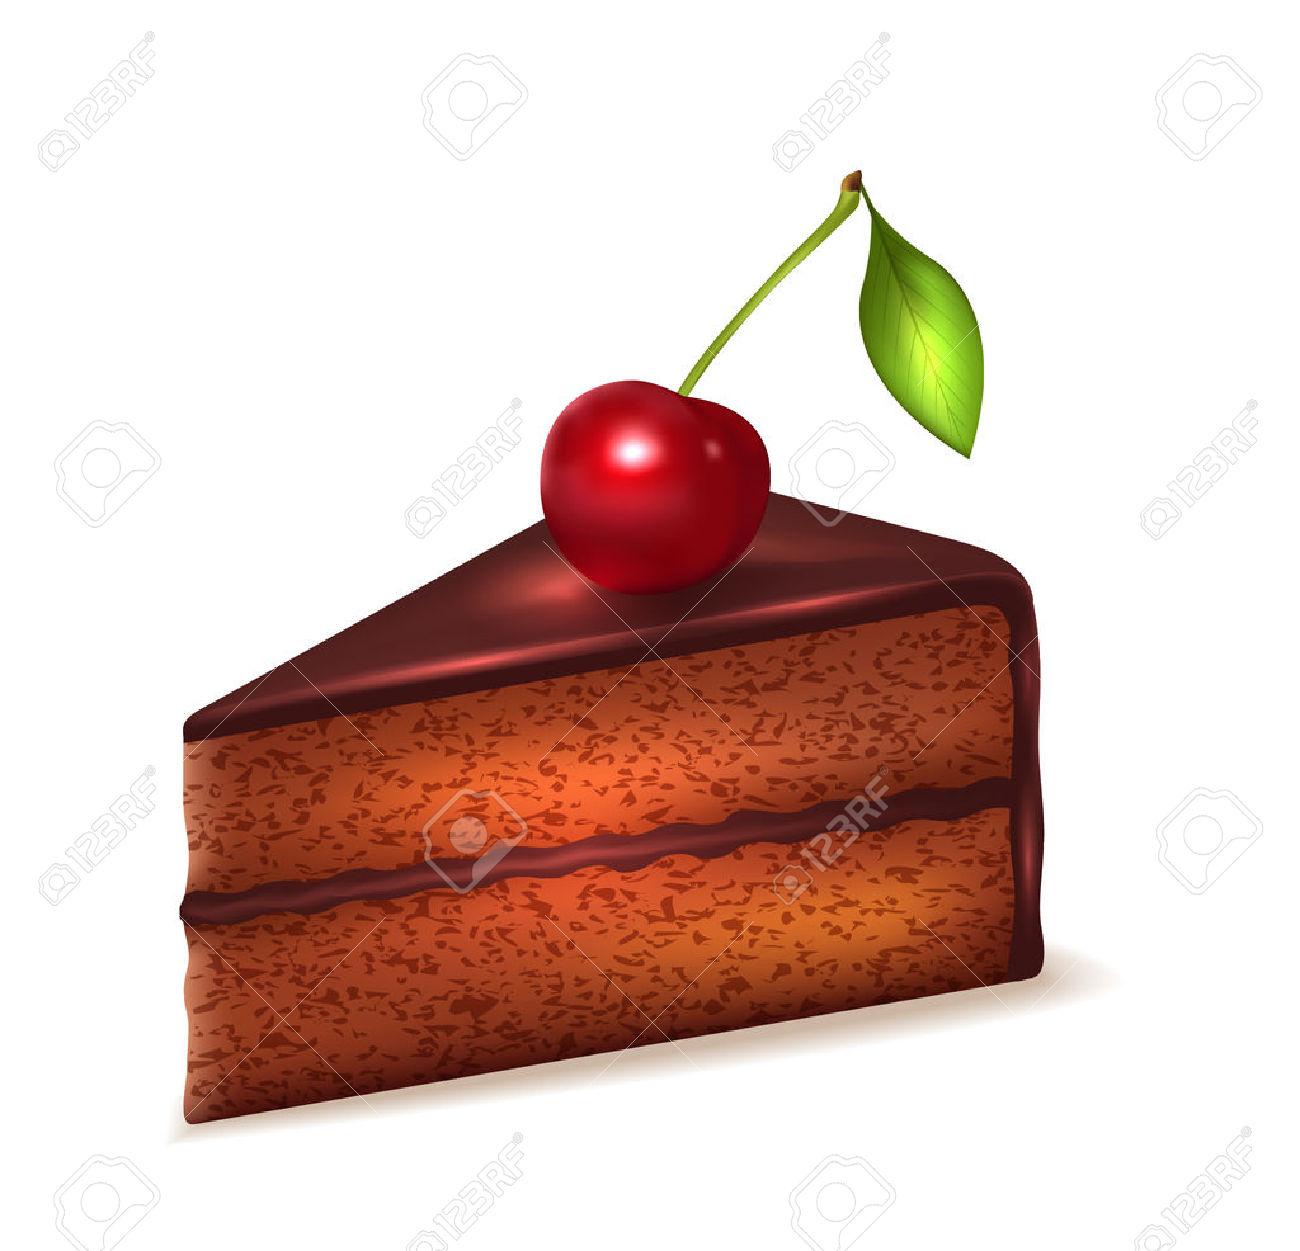 Slice of chocolate cake clipart jpg black and white download Piece Of Chocolate Sponge Cake With Cherry Isolated On White ... jpg black and white download